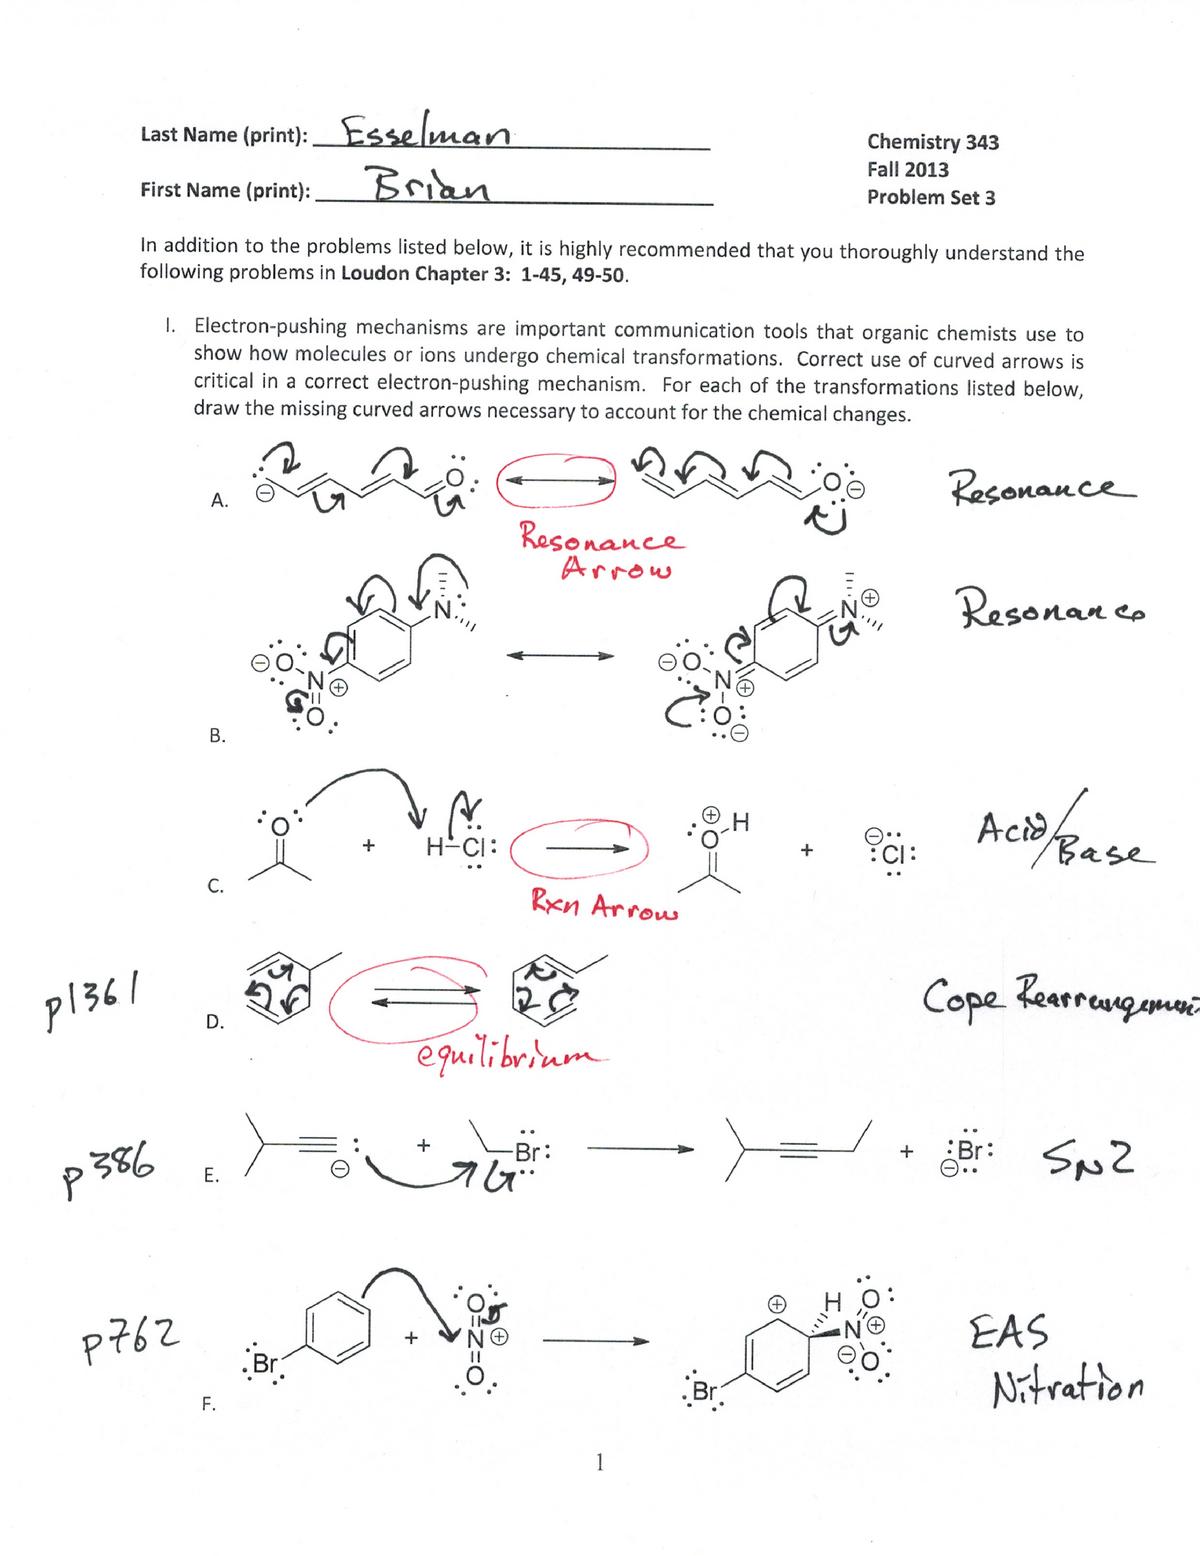 Problem Set 3 Fall 2014-Key - CHEM 343: Introductory Organic